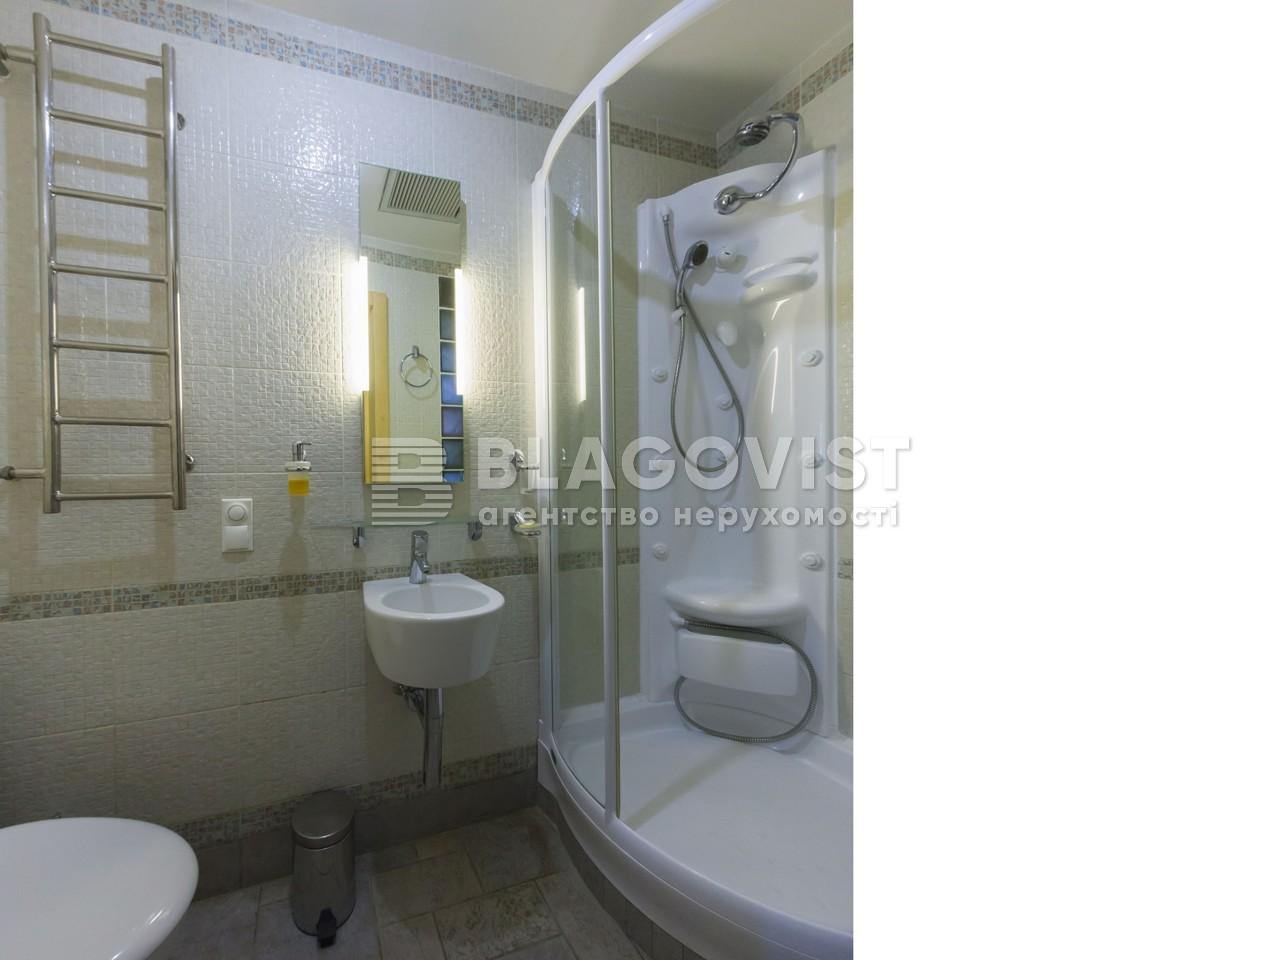 Квартира R-20216, Ковпака, 17, Киев - Фото 14